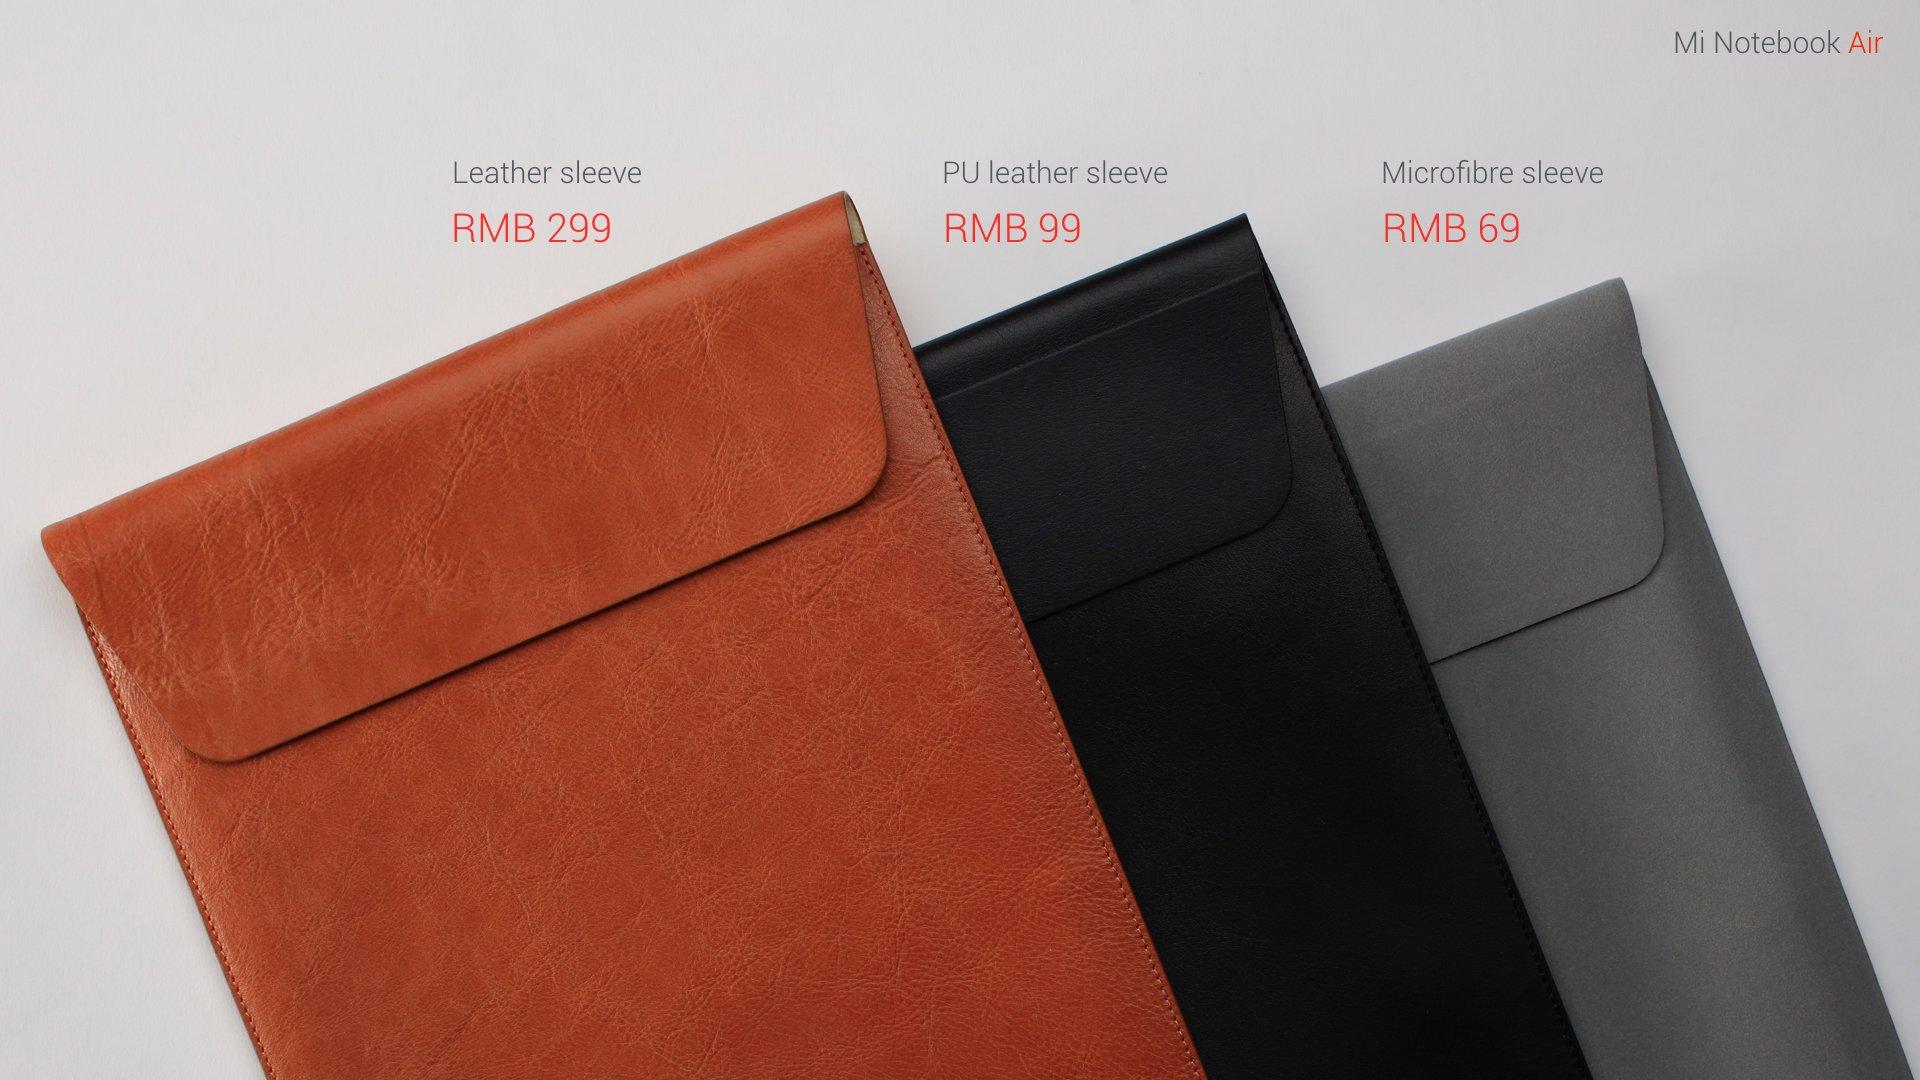 Xiaomi unveils the Mi Notebook Air, its Macbook Air killer 9